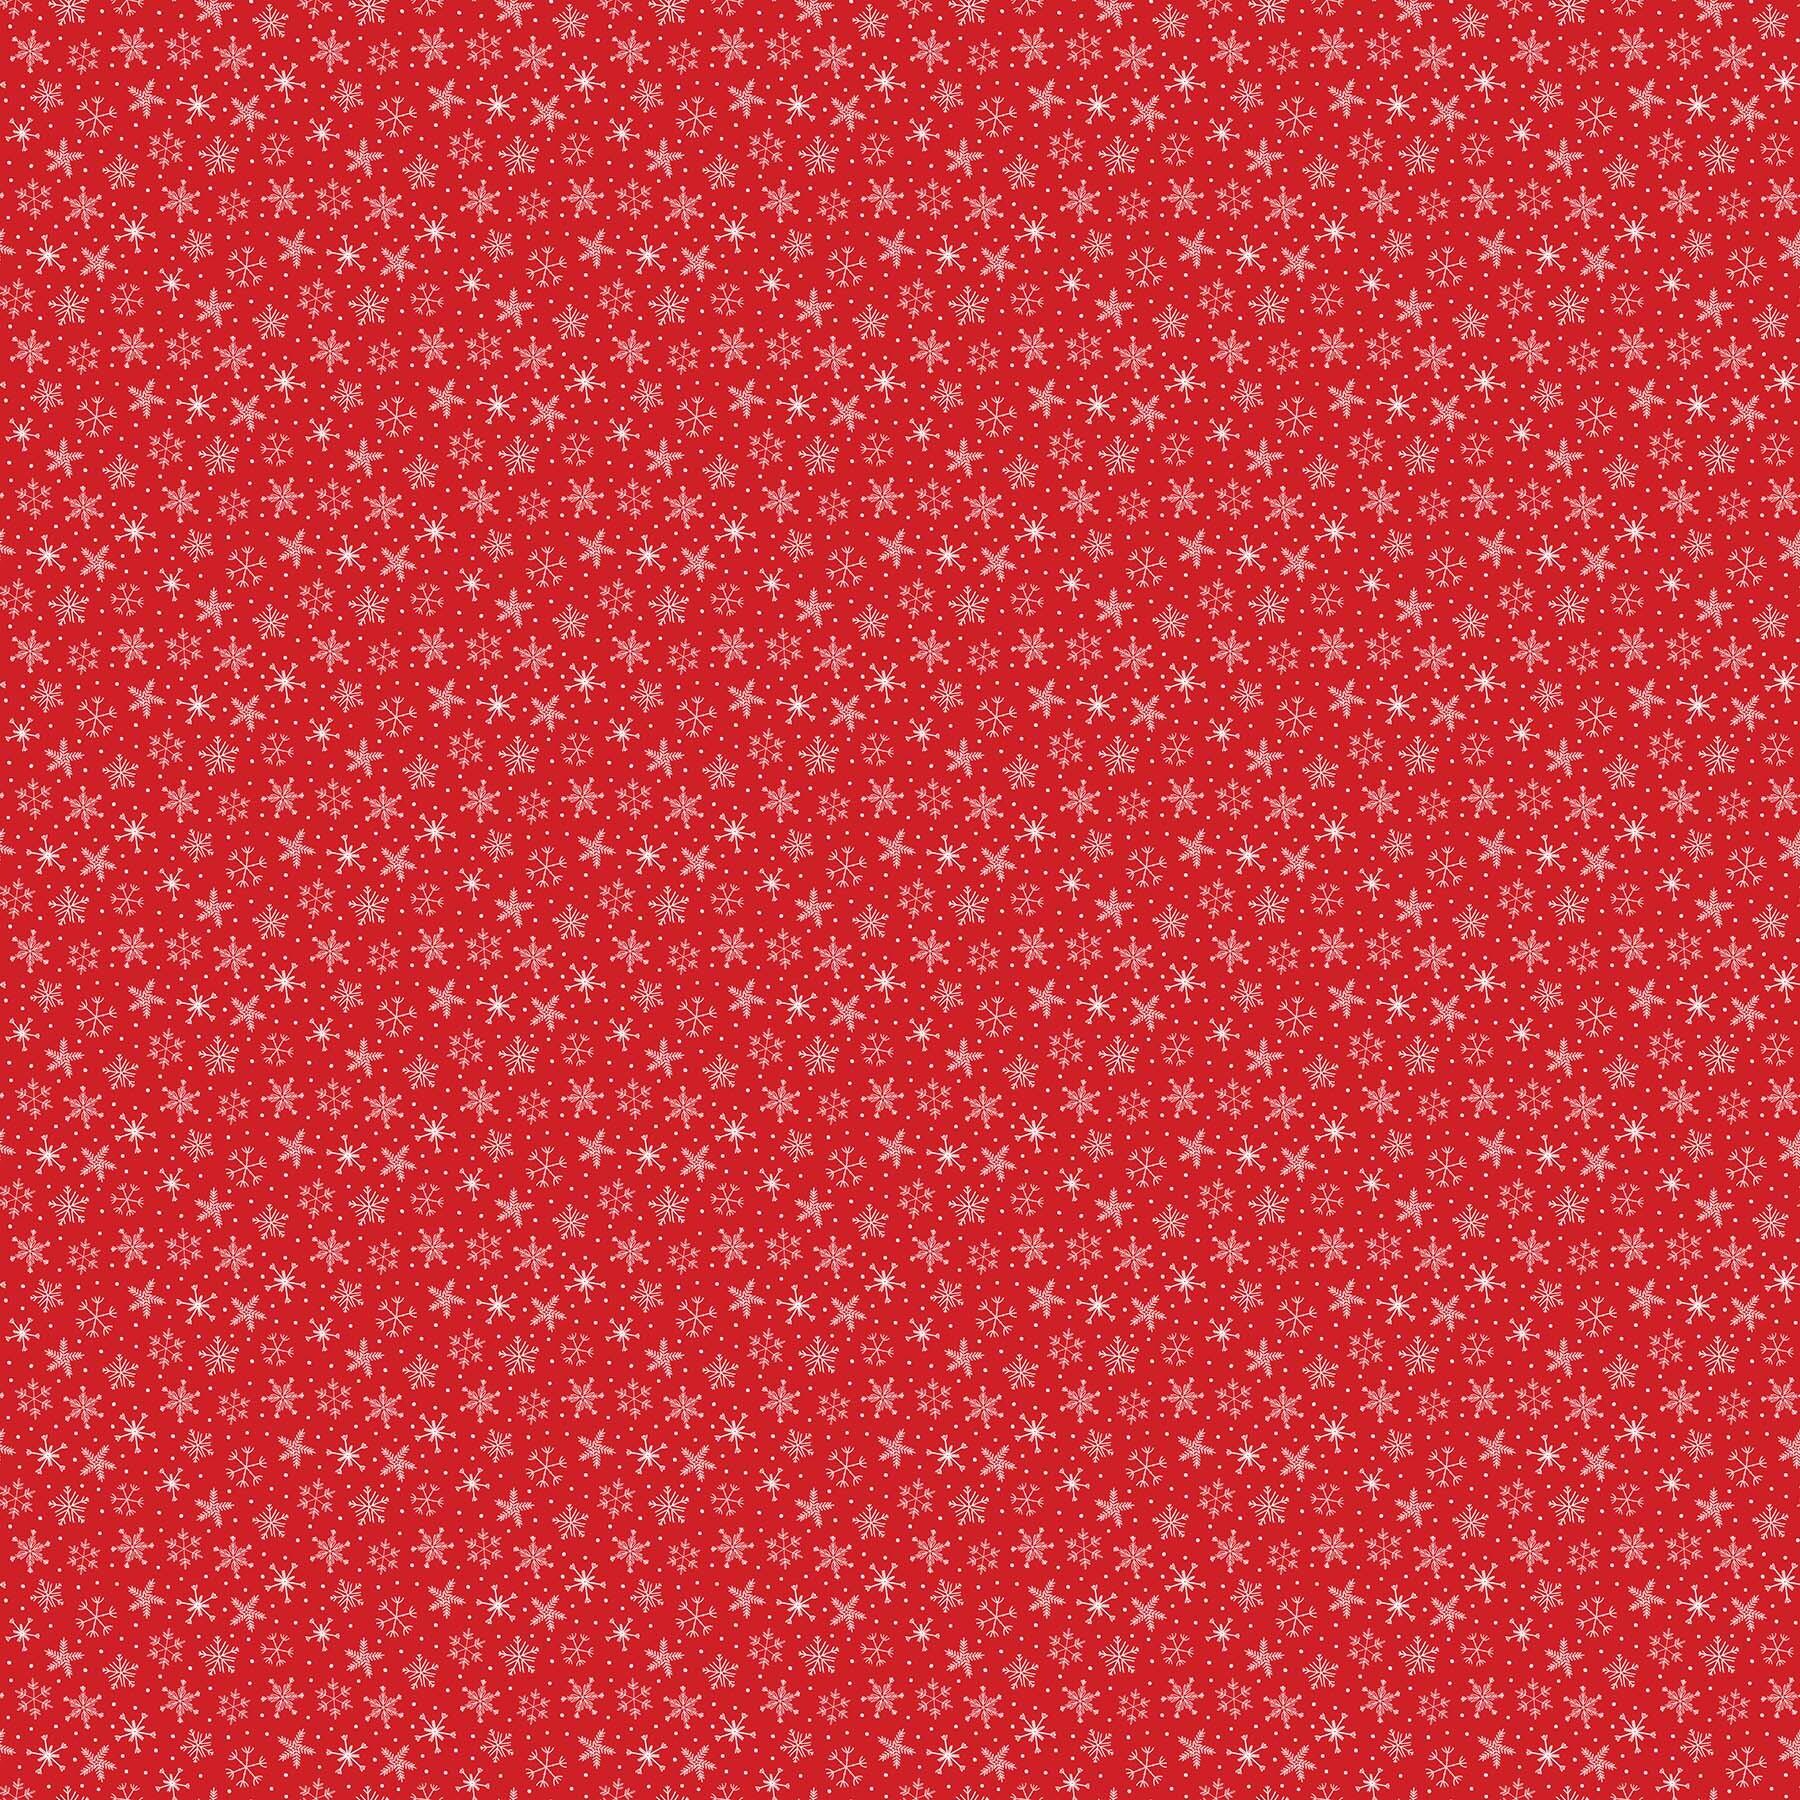 Santa Paws - Red Snowflake - 1/2m cut 58028